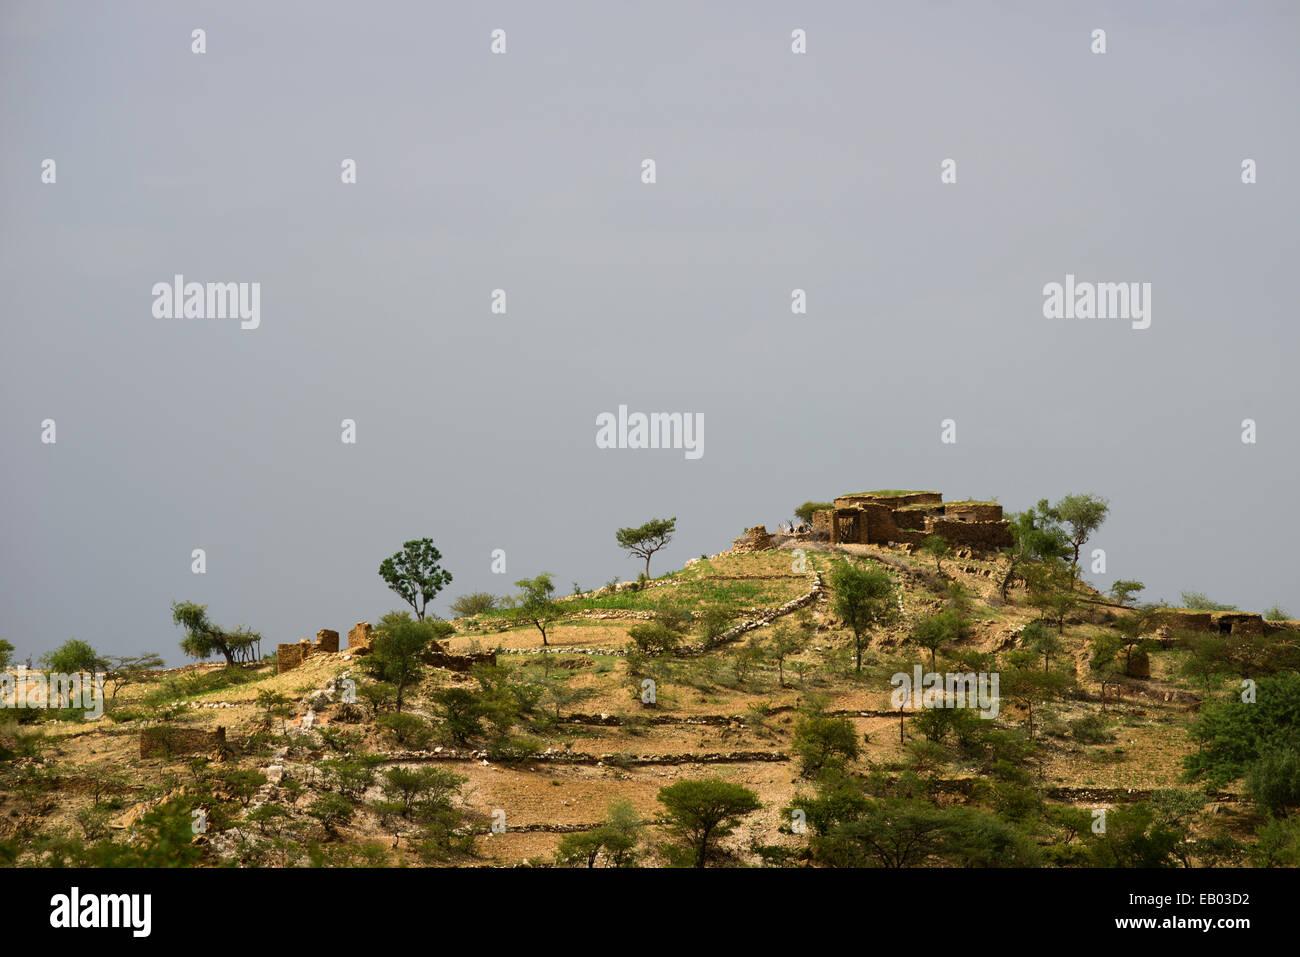 Traditional stone houses of the Tigray, Ethiopia - Stock Image